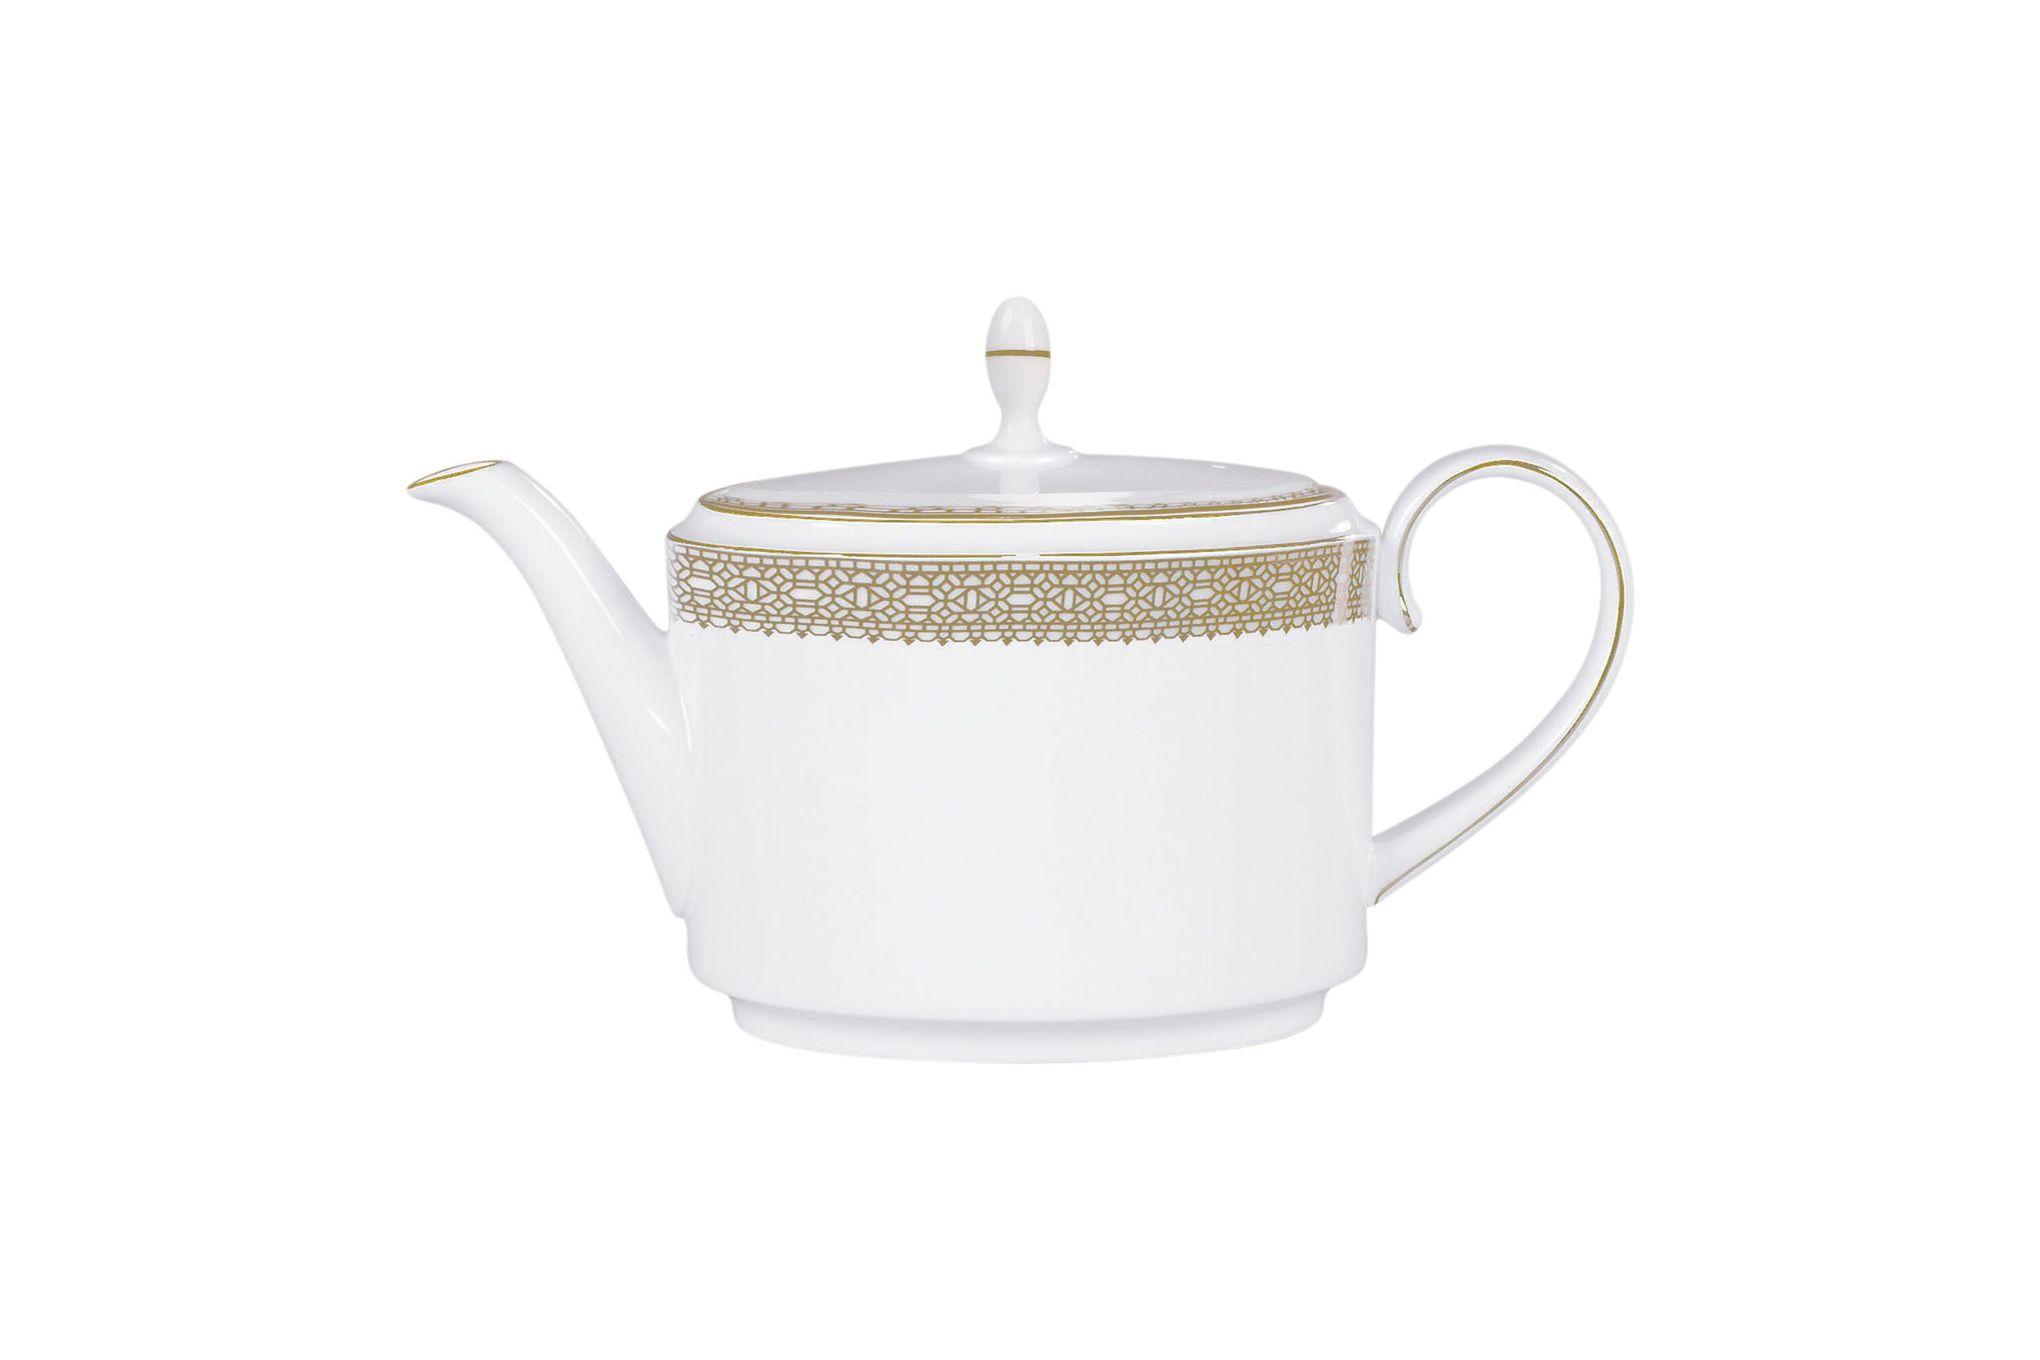 Vera Wang for Wedgwood Lace Gold Teapot 0.66l thumb 1